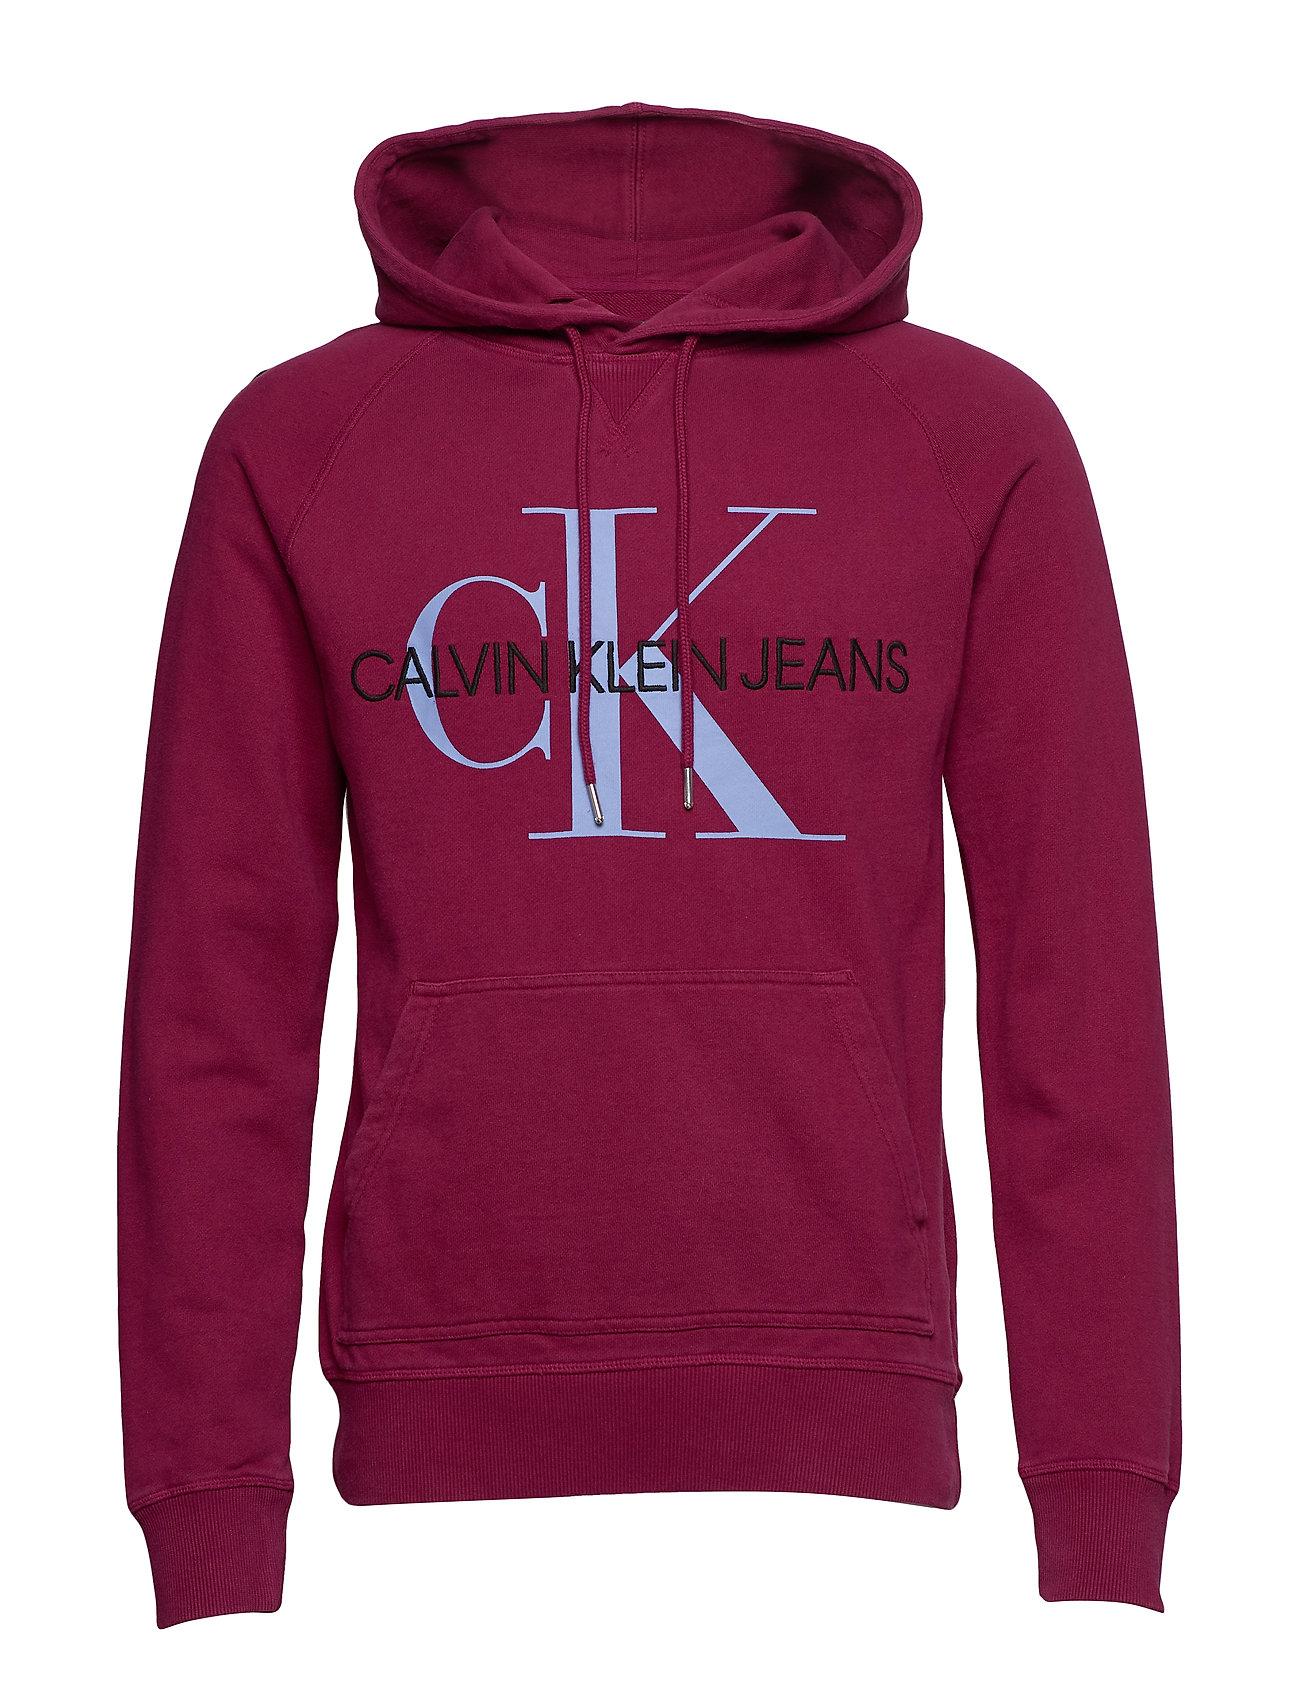 Calvin Klein Jeans WASHED REG MONOGRAM HOODIE - BEET RED